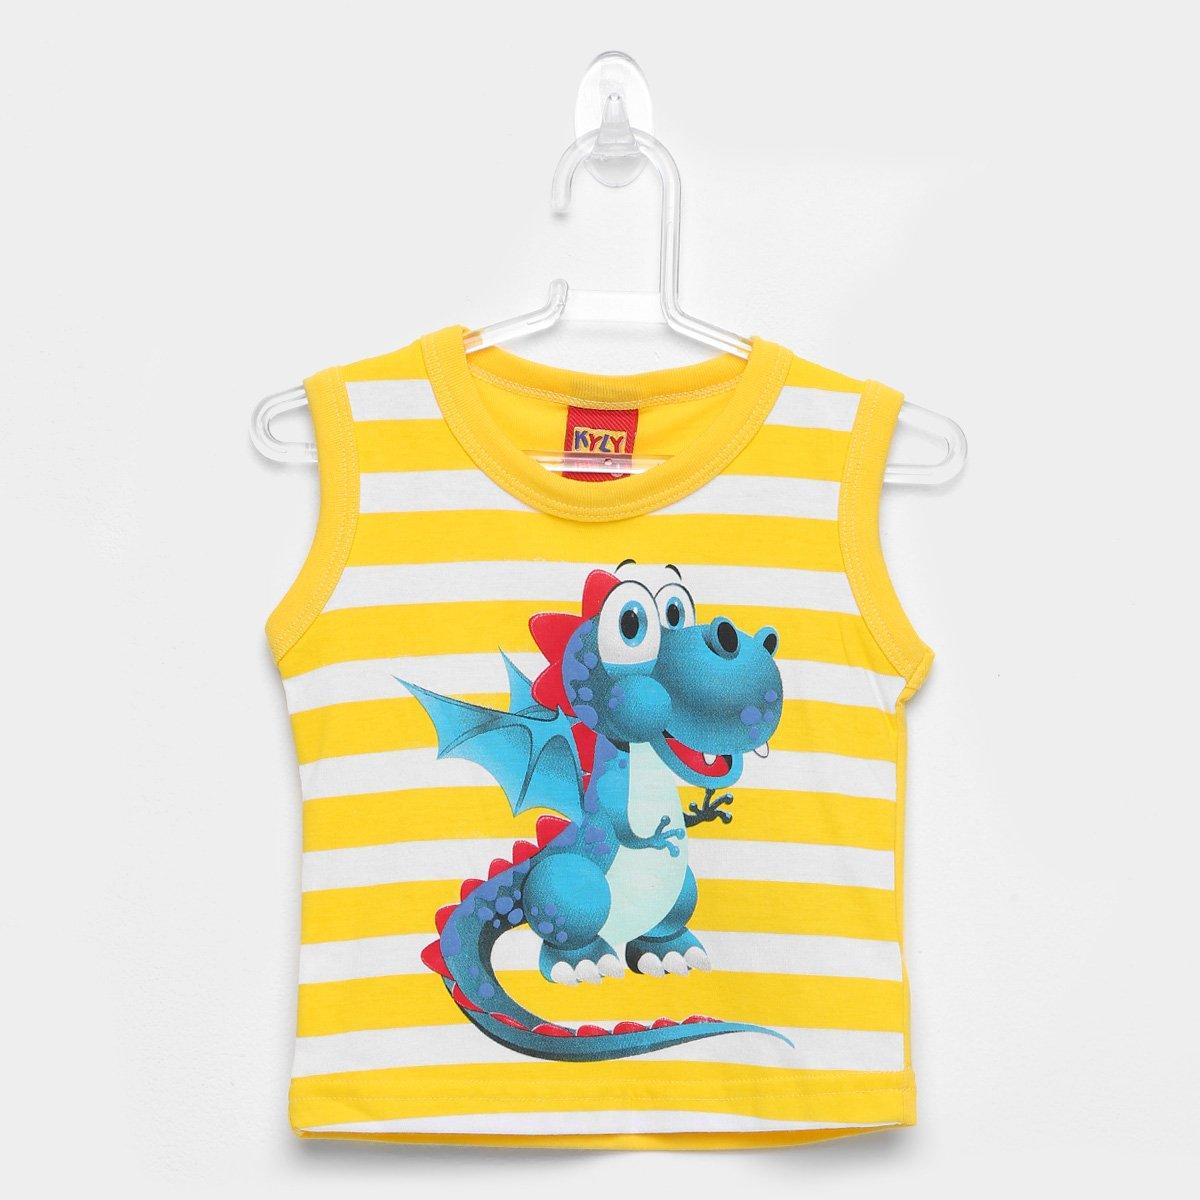 30a15d6bb Regata Infantil Kyly Dinossauro Listrada Masculina - Amarelo | Zattini